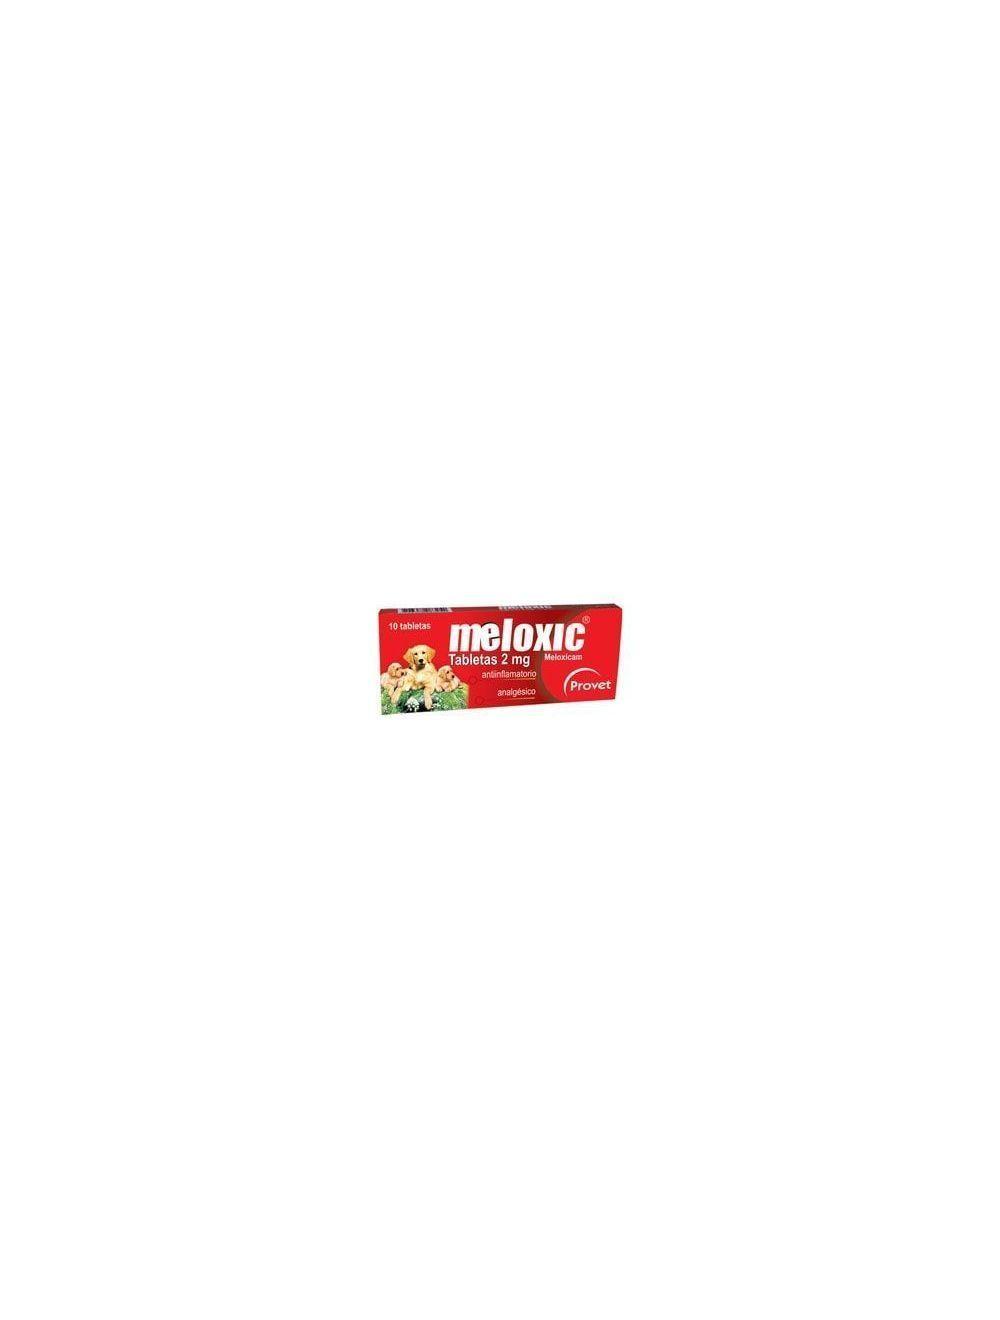 Meloxic 2 mg x 10 tabletas